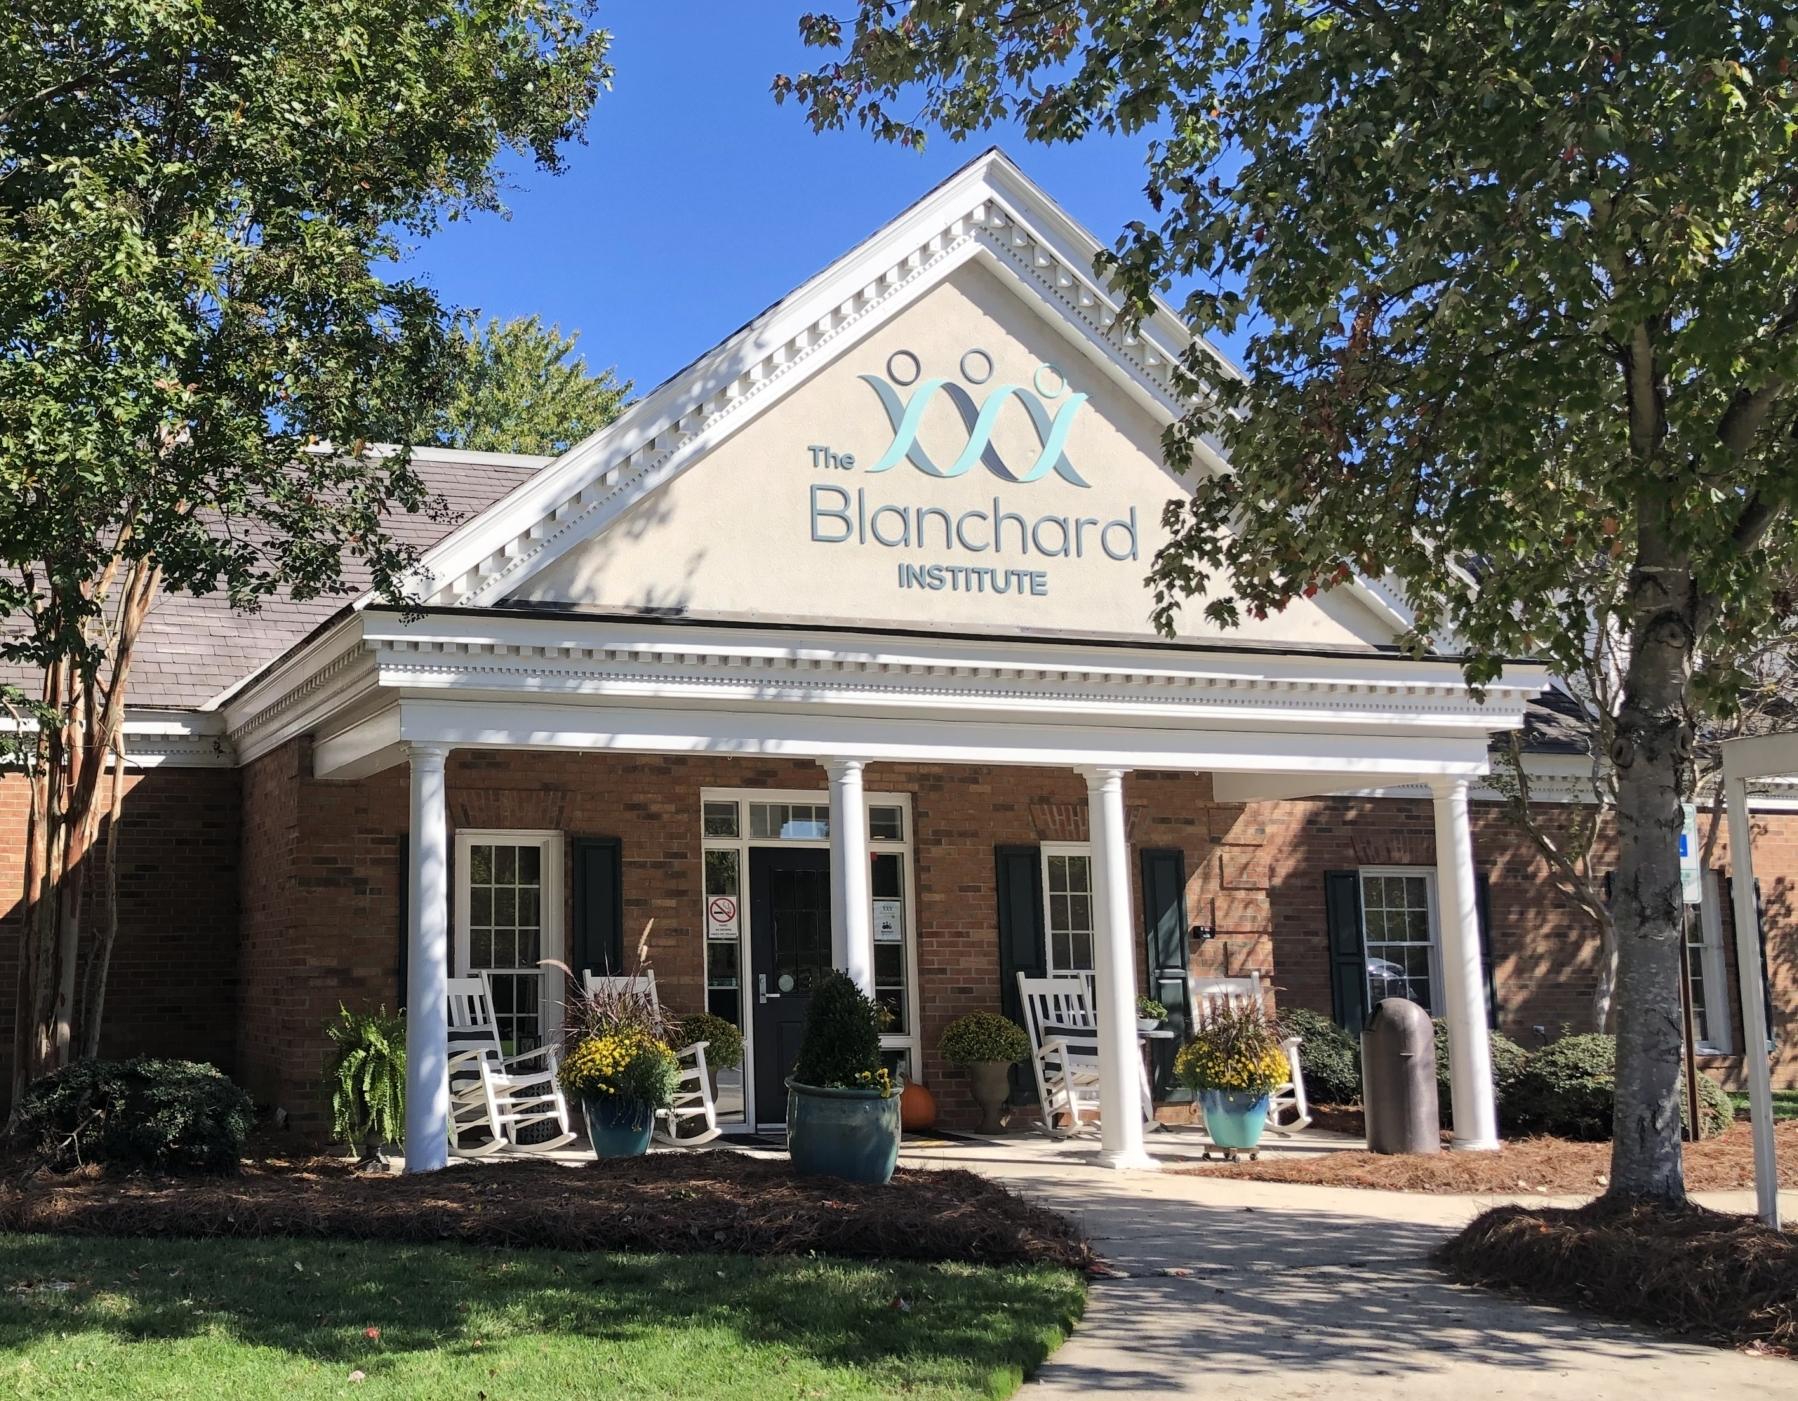 The Blanchard Institute Charlotte, North Carolina